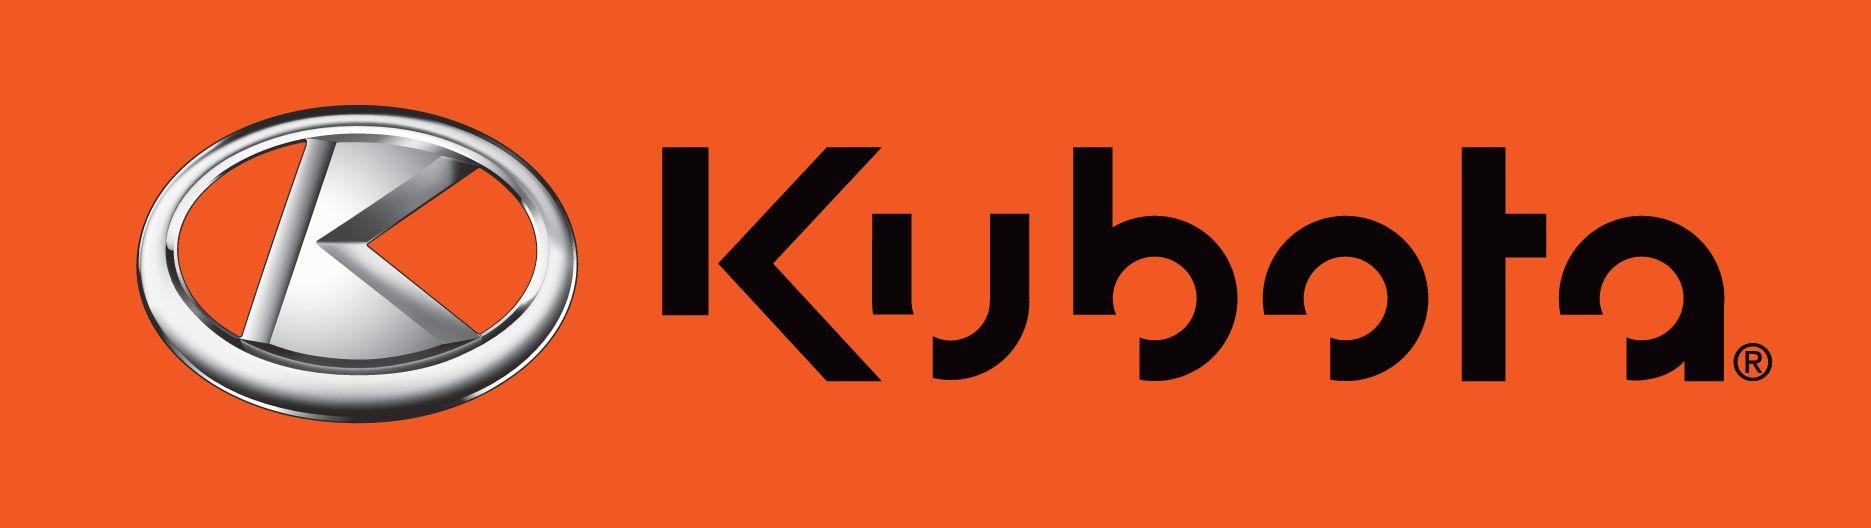 Kubota_Logo.jpg